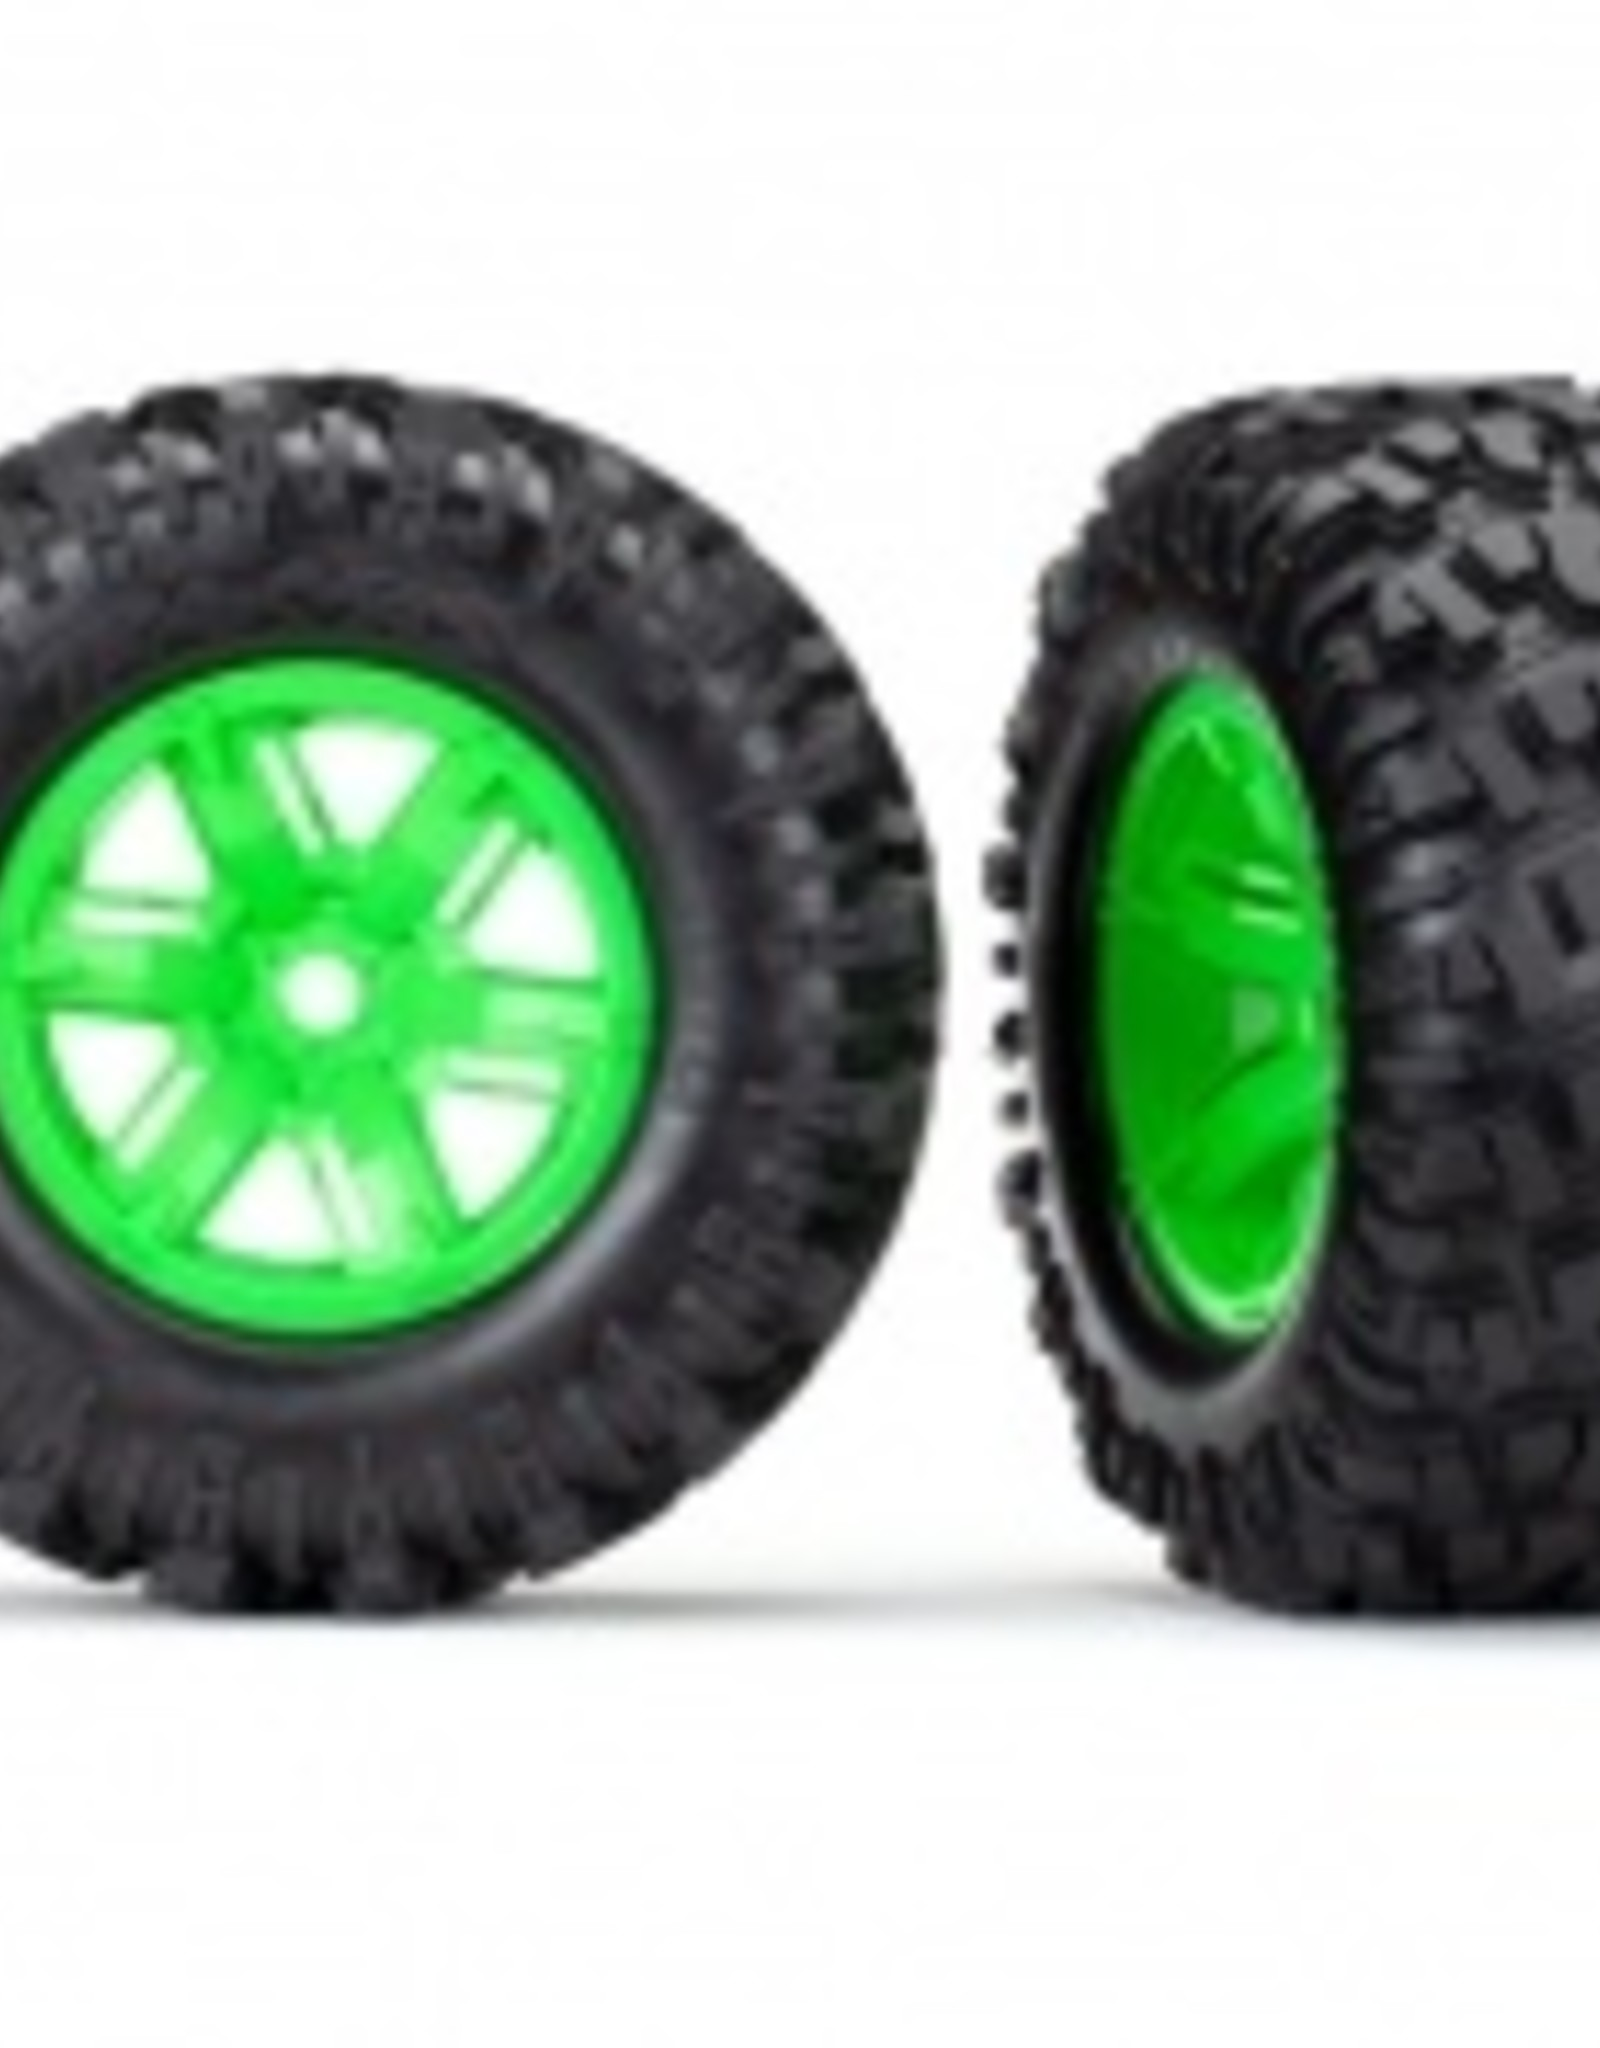 Traxxas Traxxas X-Maxx Tires & wheels, assembled, glued (X-Maxx® green wheels, Maxx® AT tires, foam inserts) (left & right) (2)